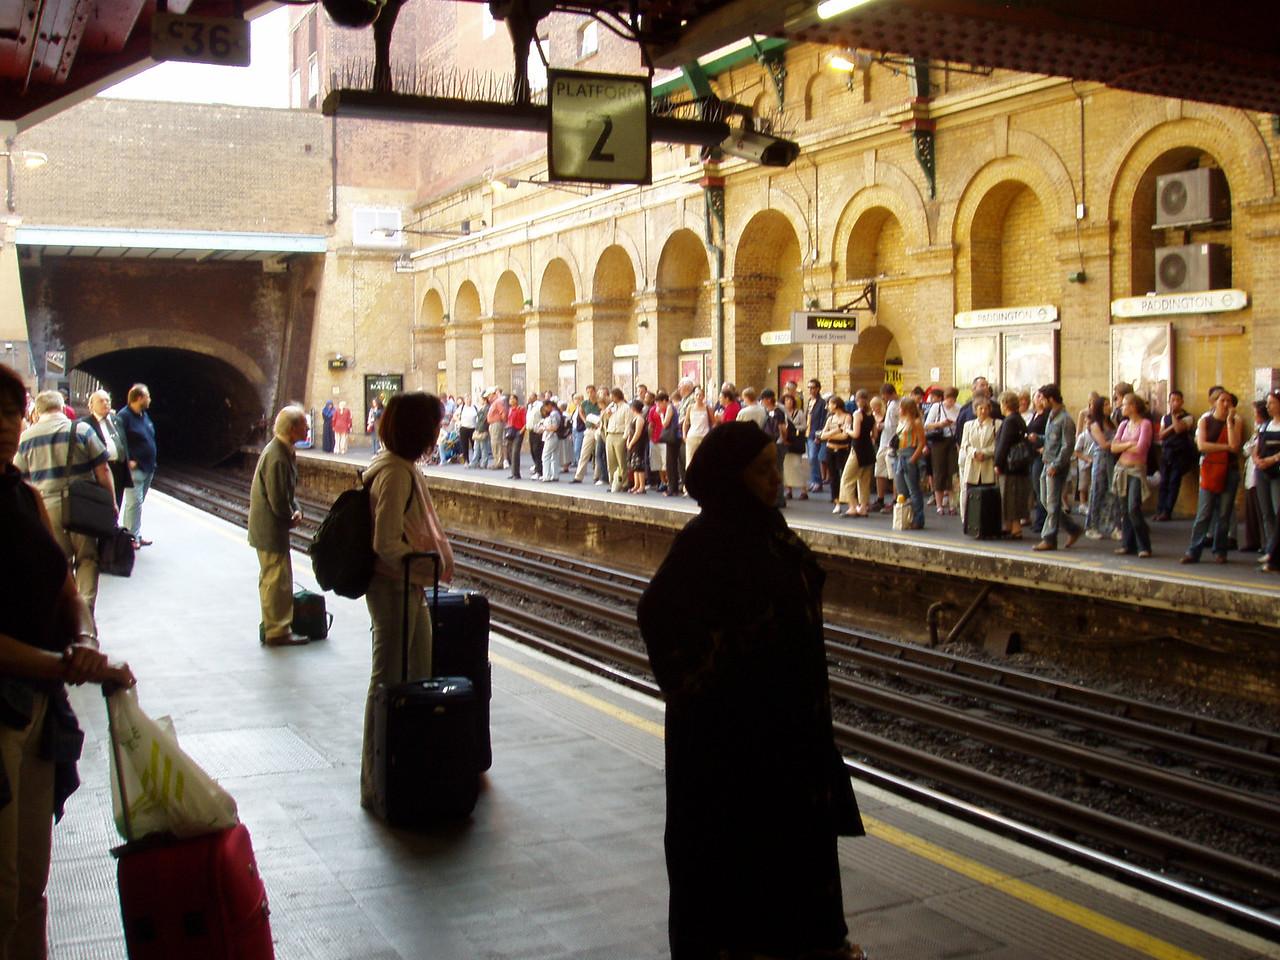 P6141345 Journey Starts at Paddington Station Underground